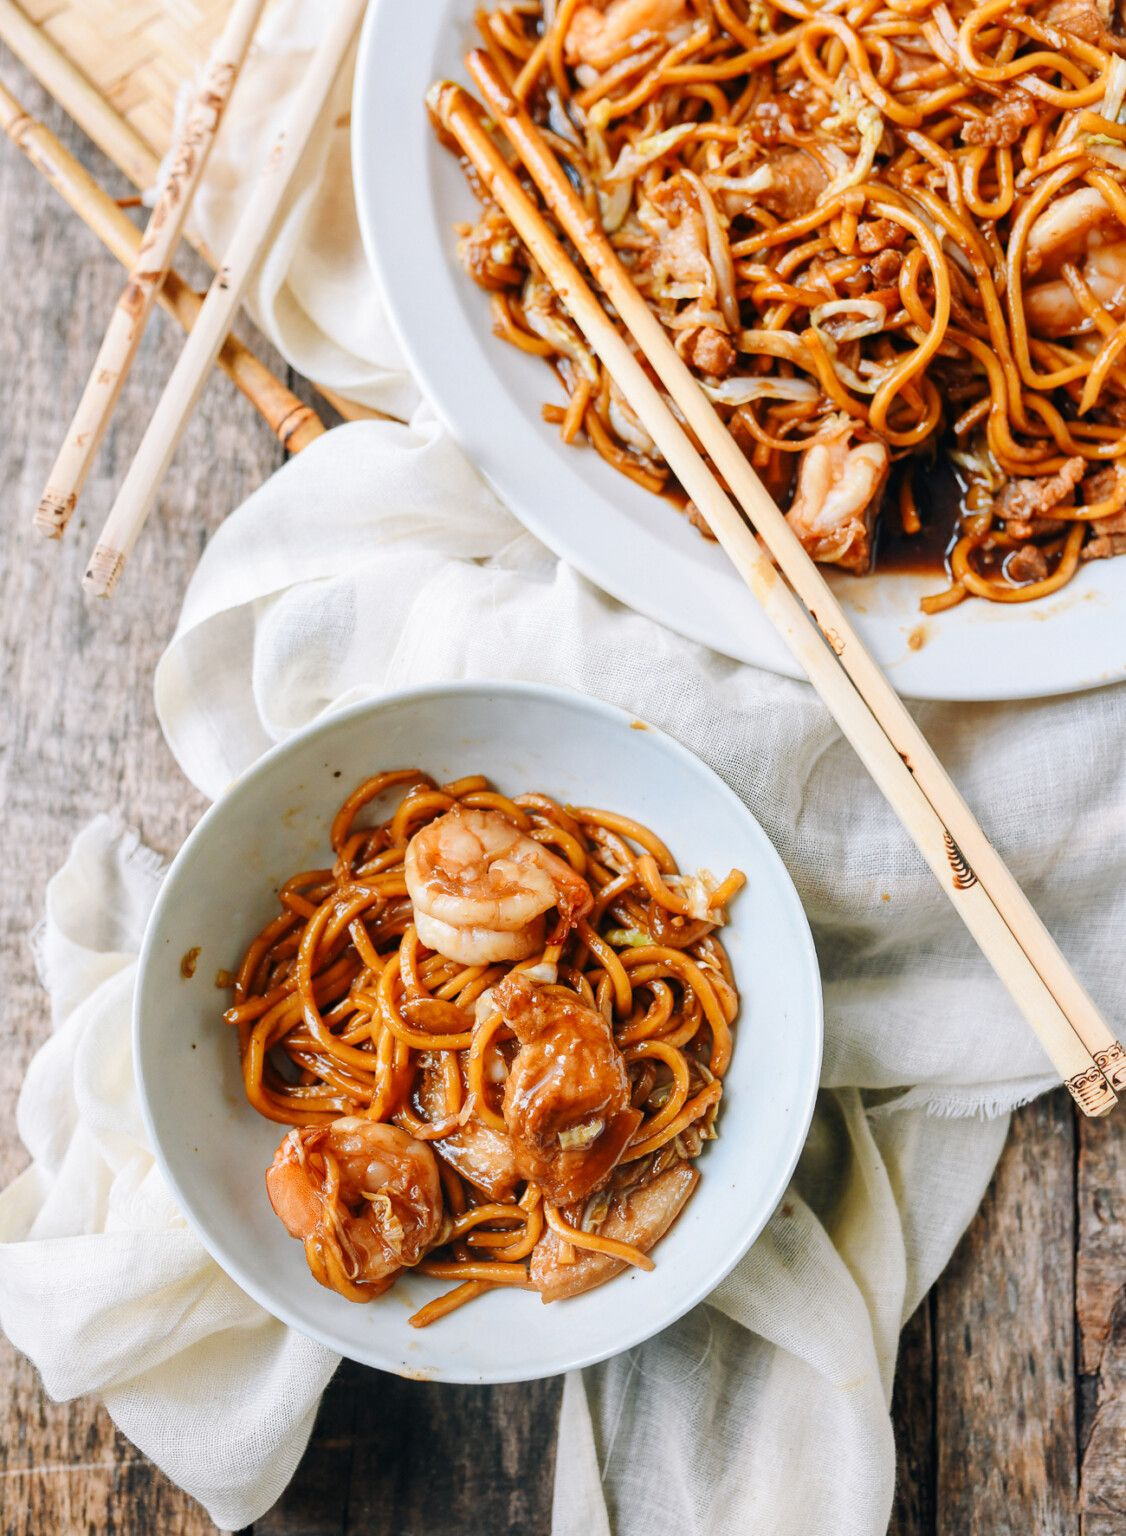 Malaysian Hokkien Mee Kl Version Recipe Asian Cooking Recipes Asian Recipes